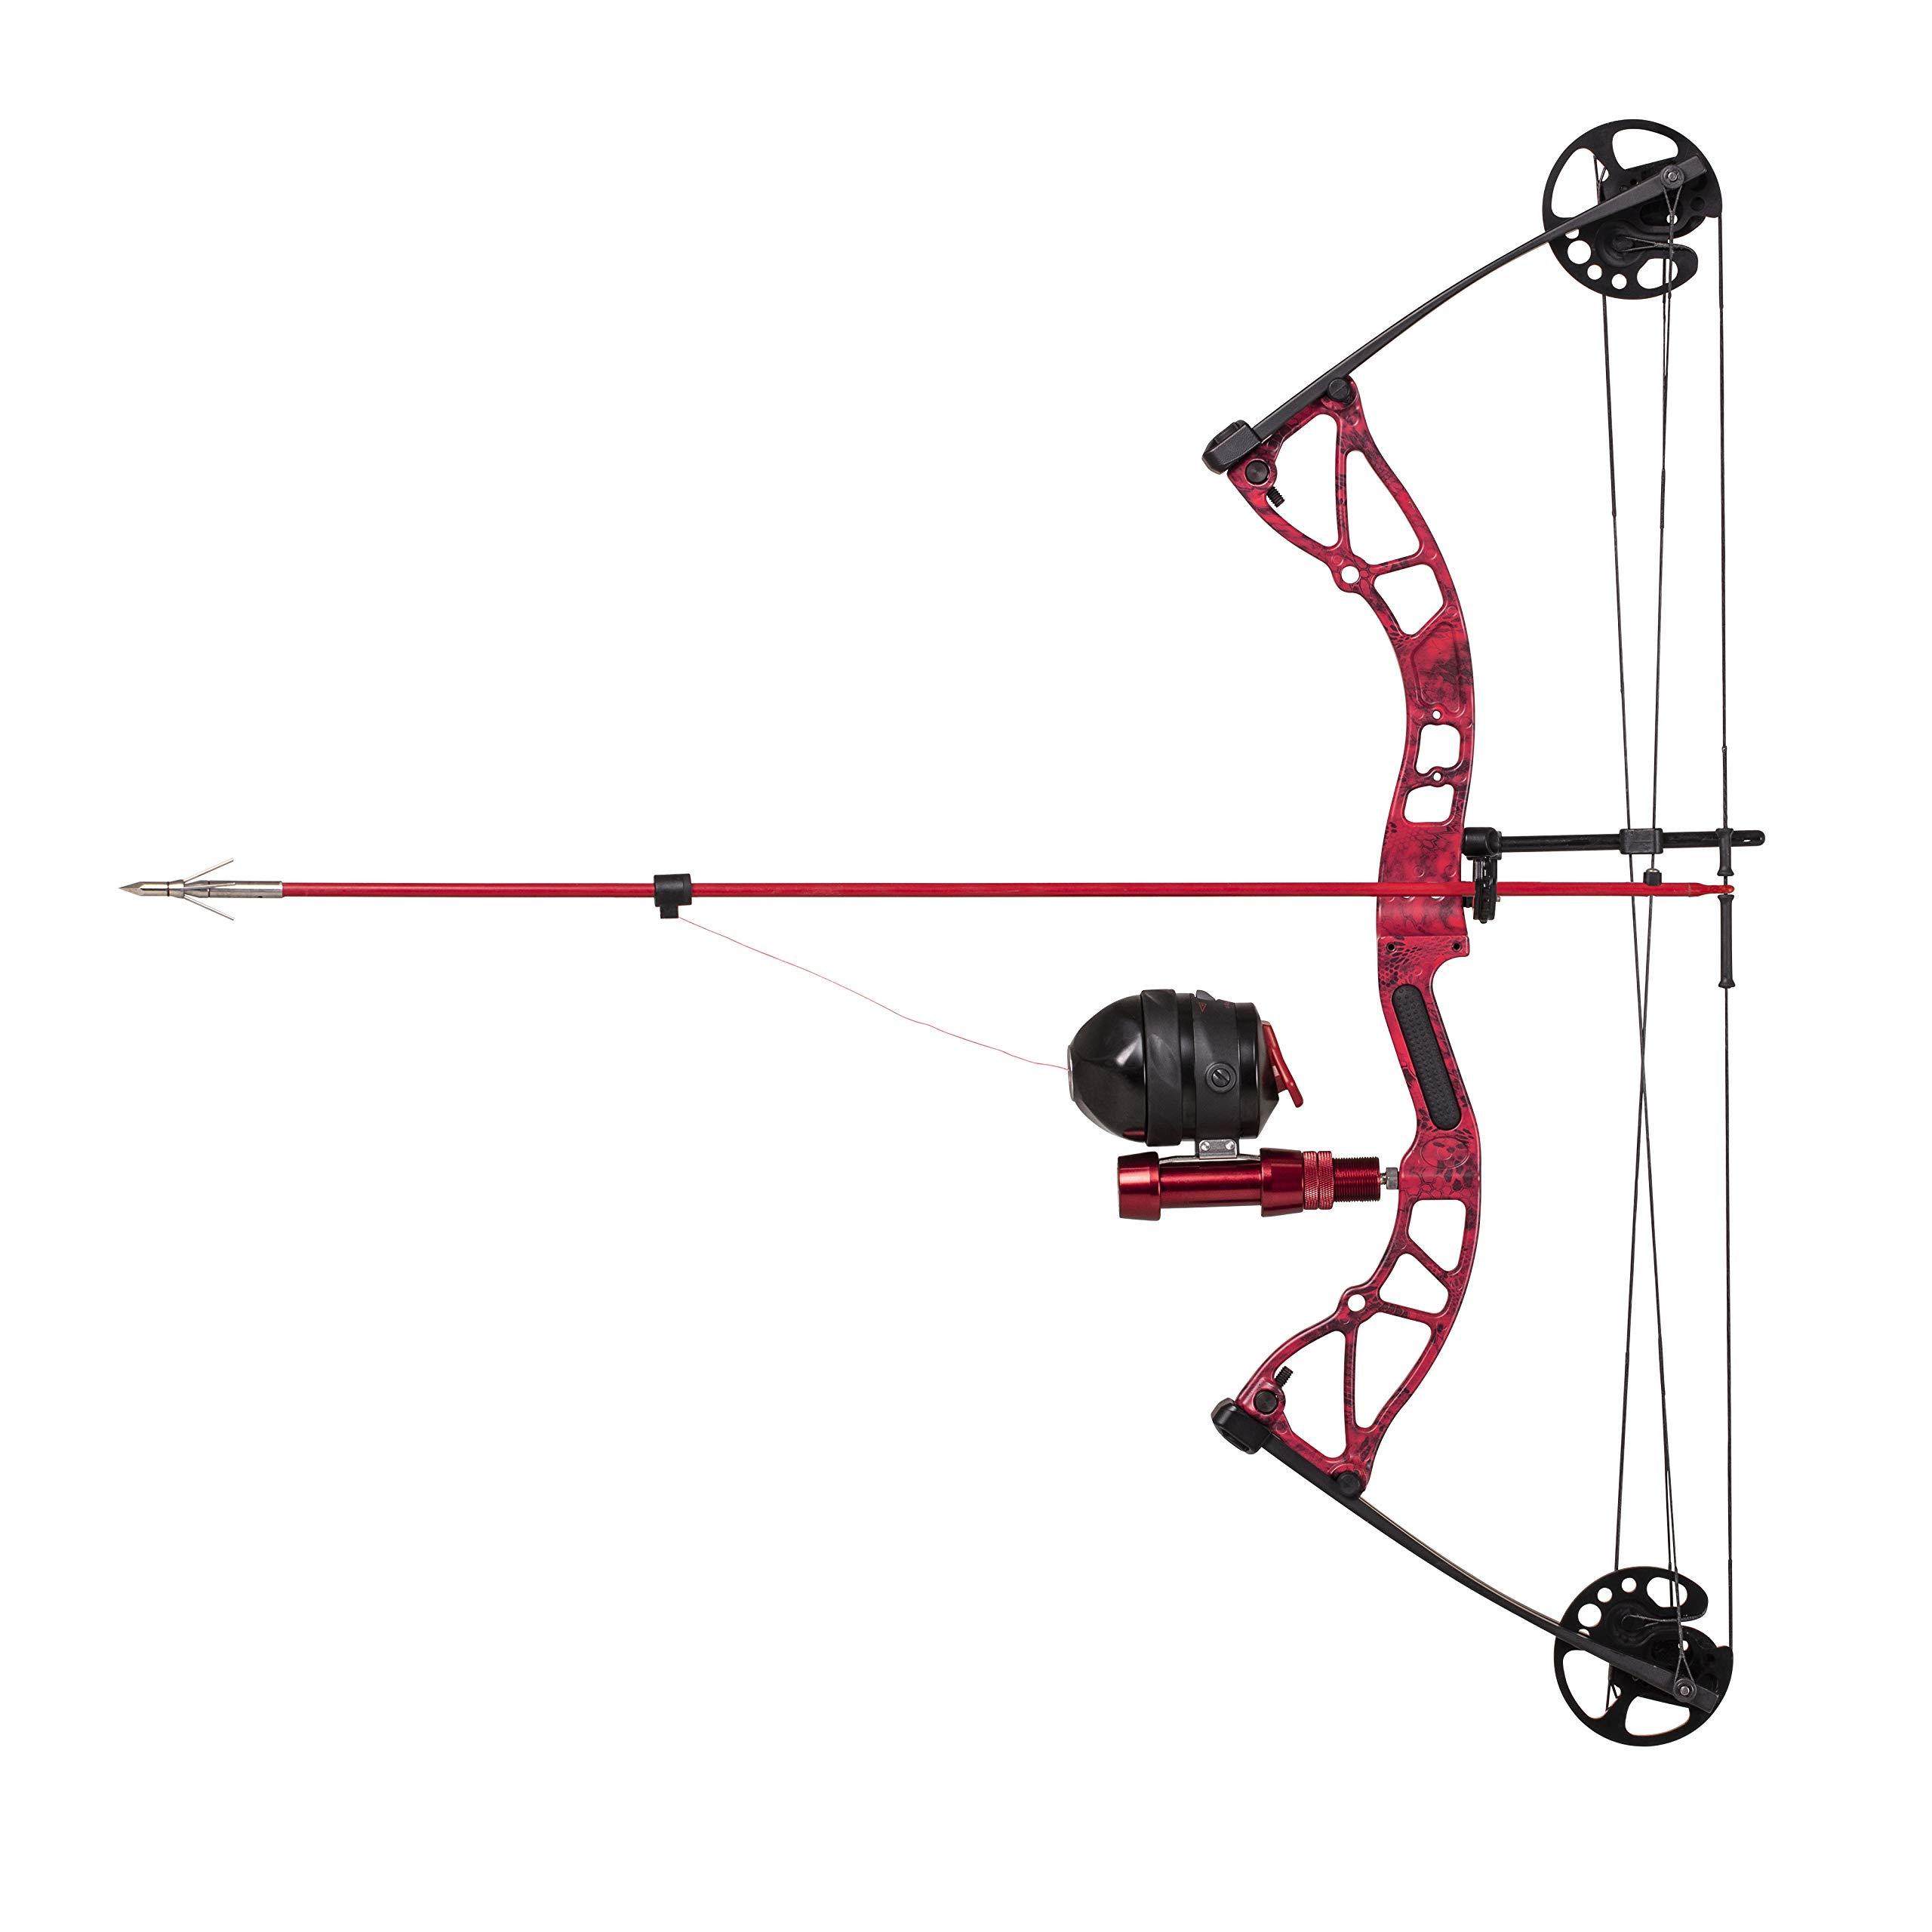 Cajun Bowfishing Shore Runner Kit Compound Bowfishing Bow Ready to Fish Kit with Arrow Rest, Bowfishing Reel, Reel Seat, Blister Buster Finger Pads, Fiberglass Arrow, Red/Black by Cajun Bowfishing